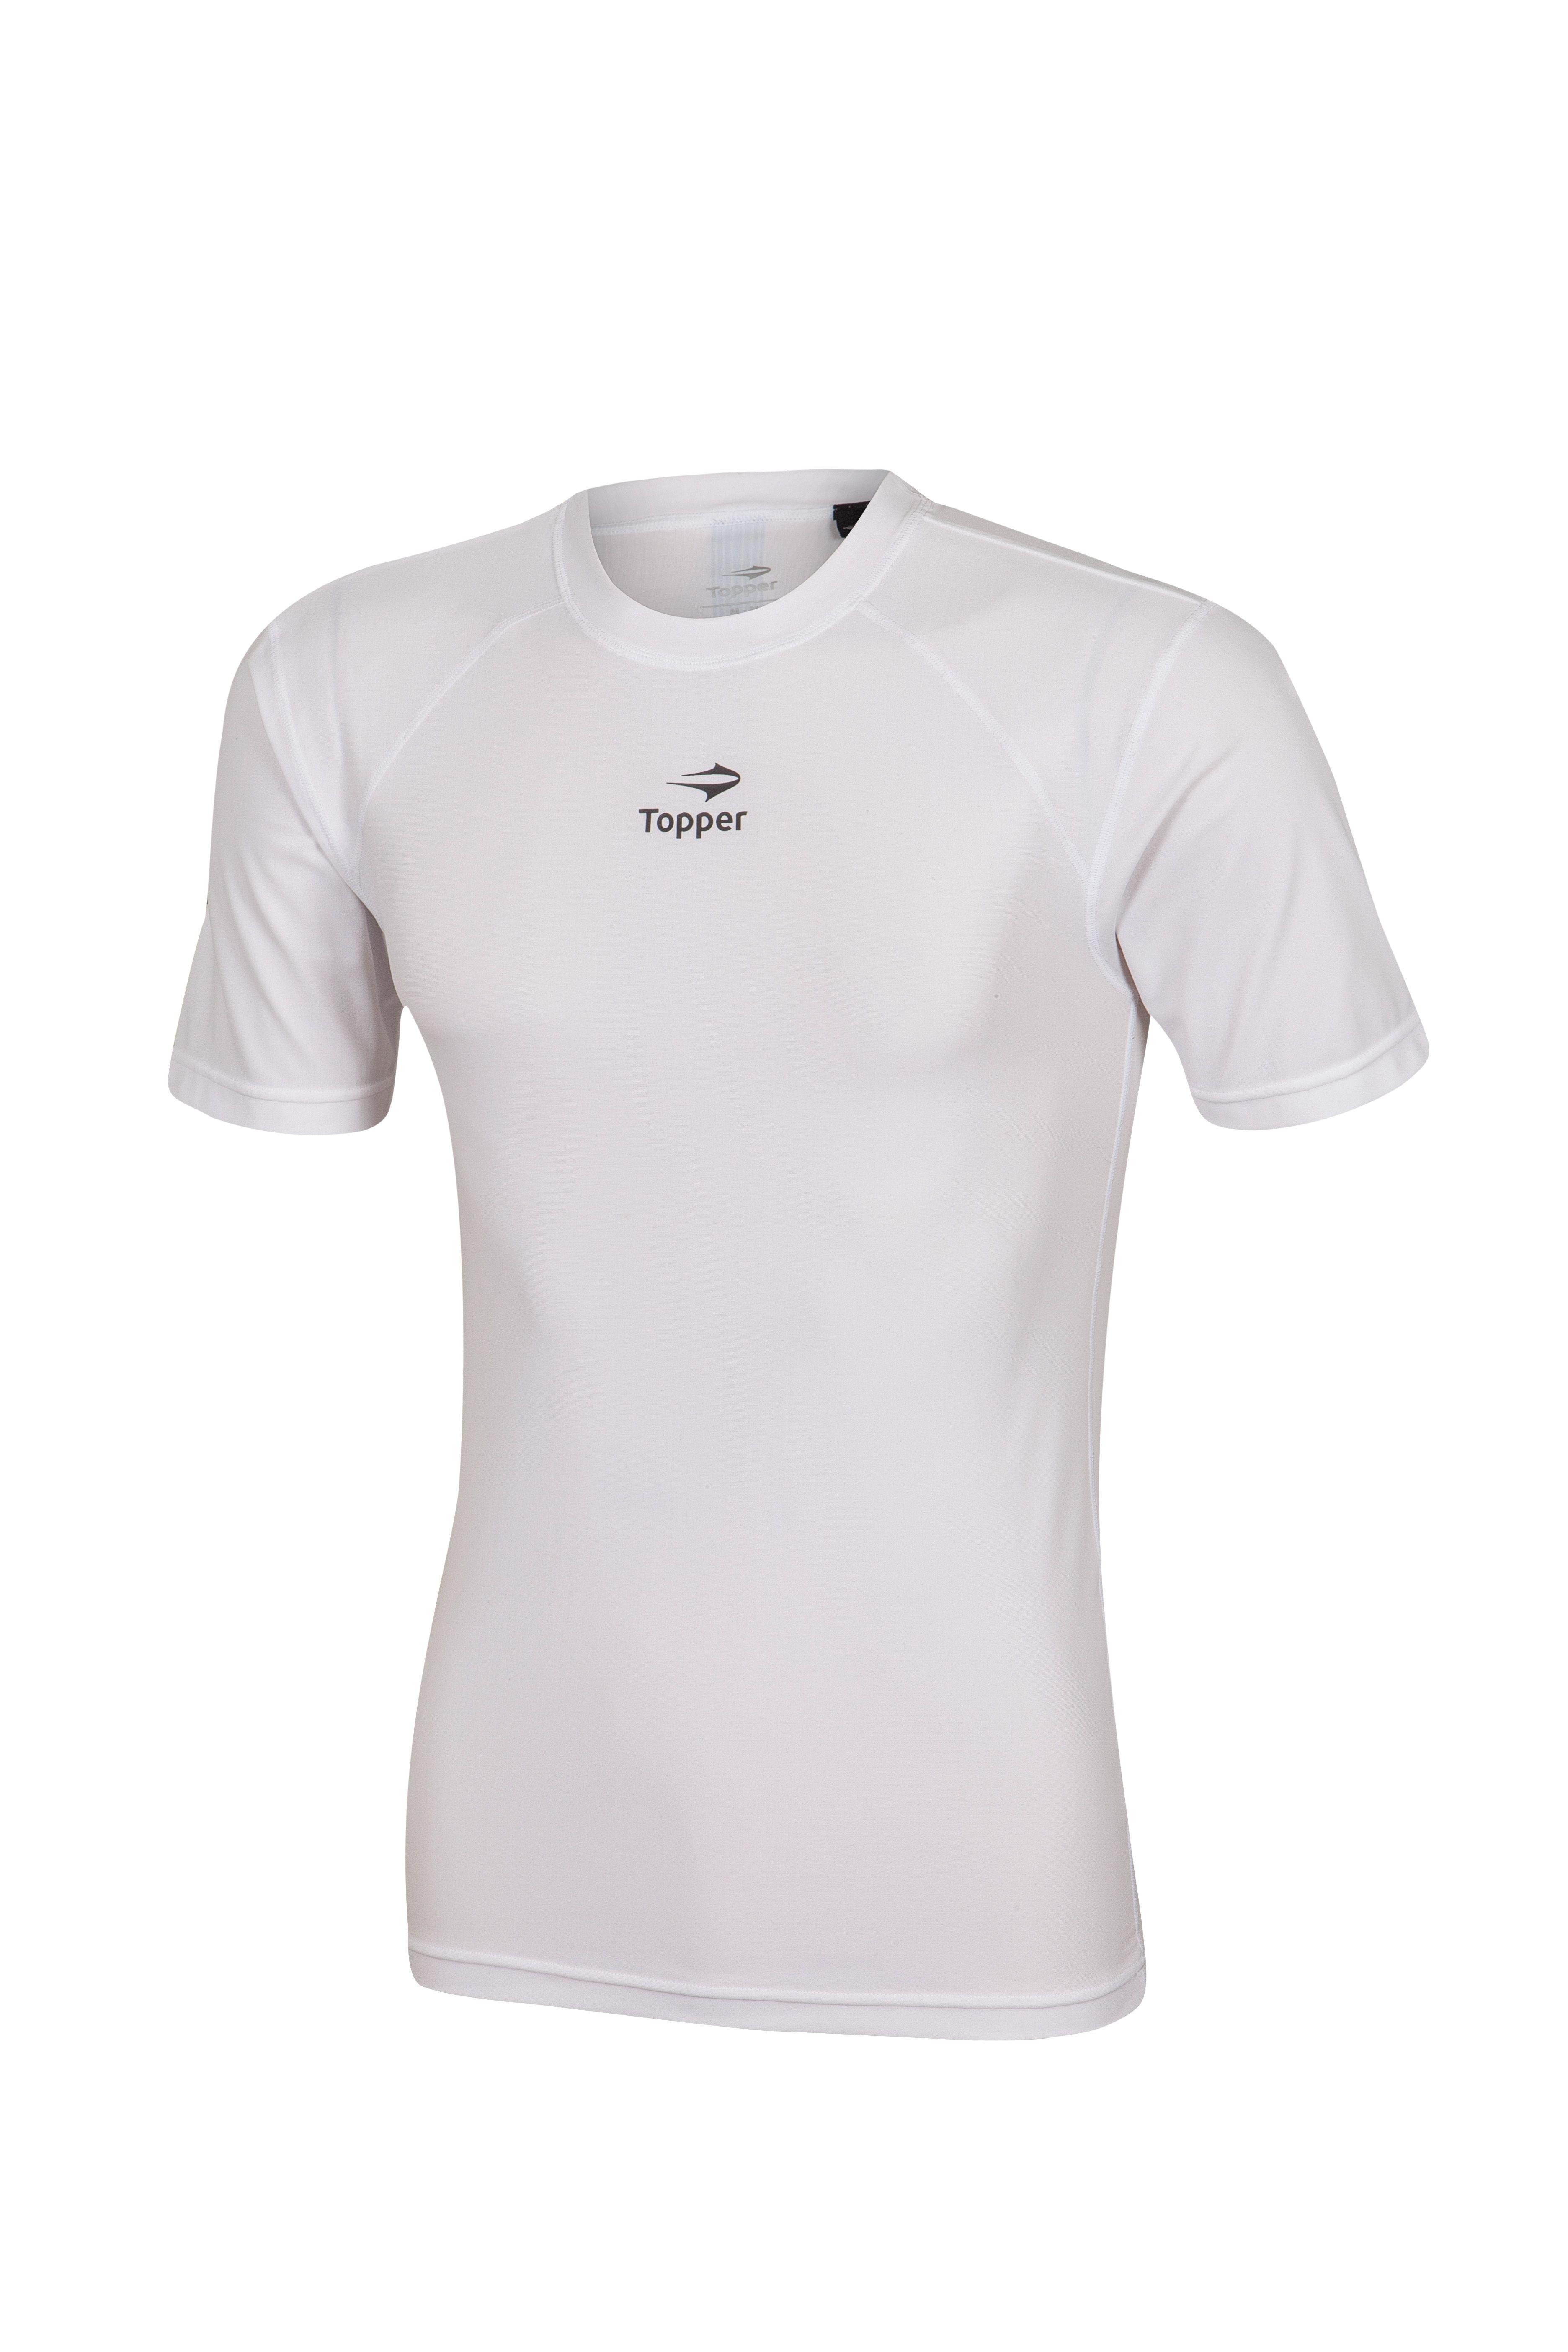 Camisa Topper Futebol Térmica Manga Curta Branca  1741192c9f813